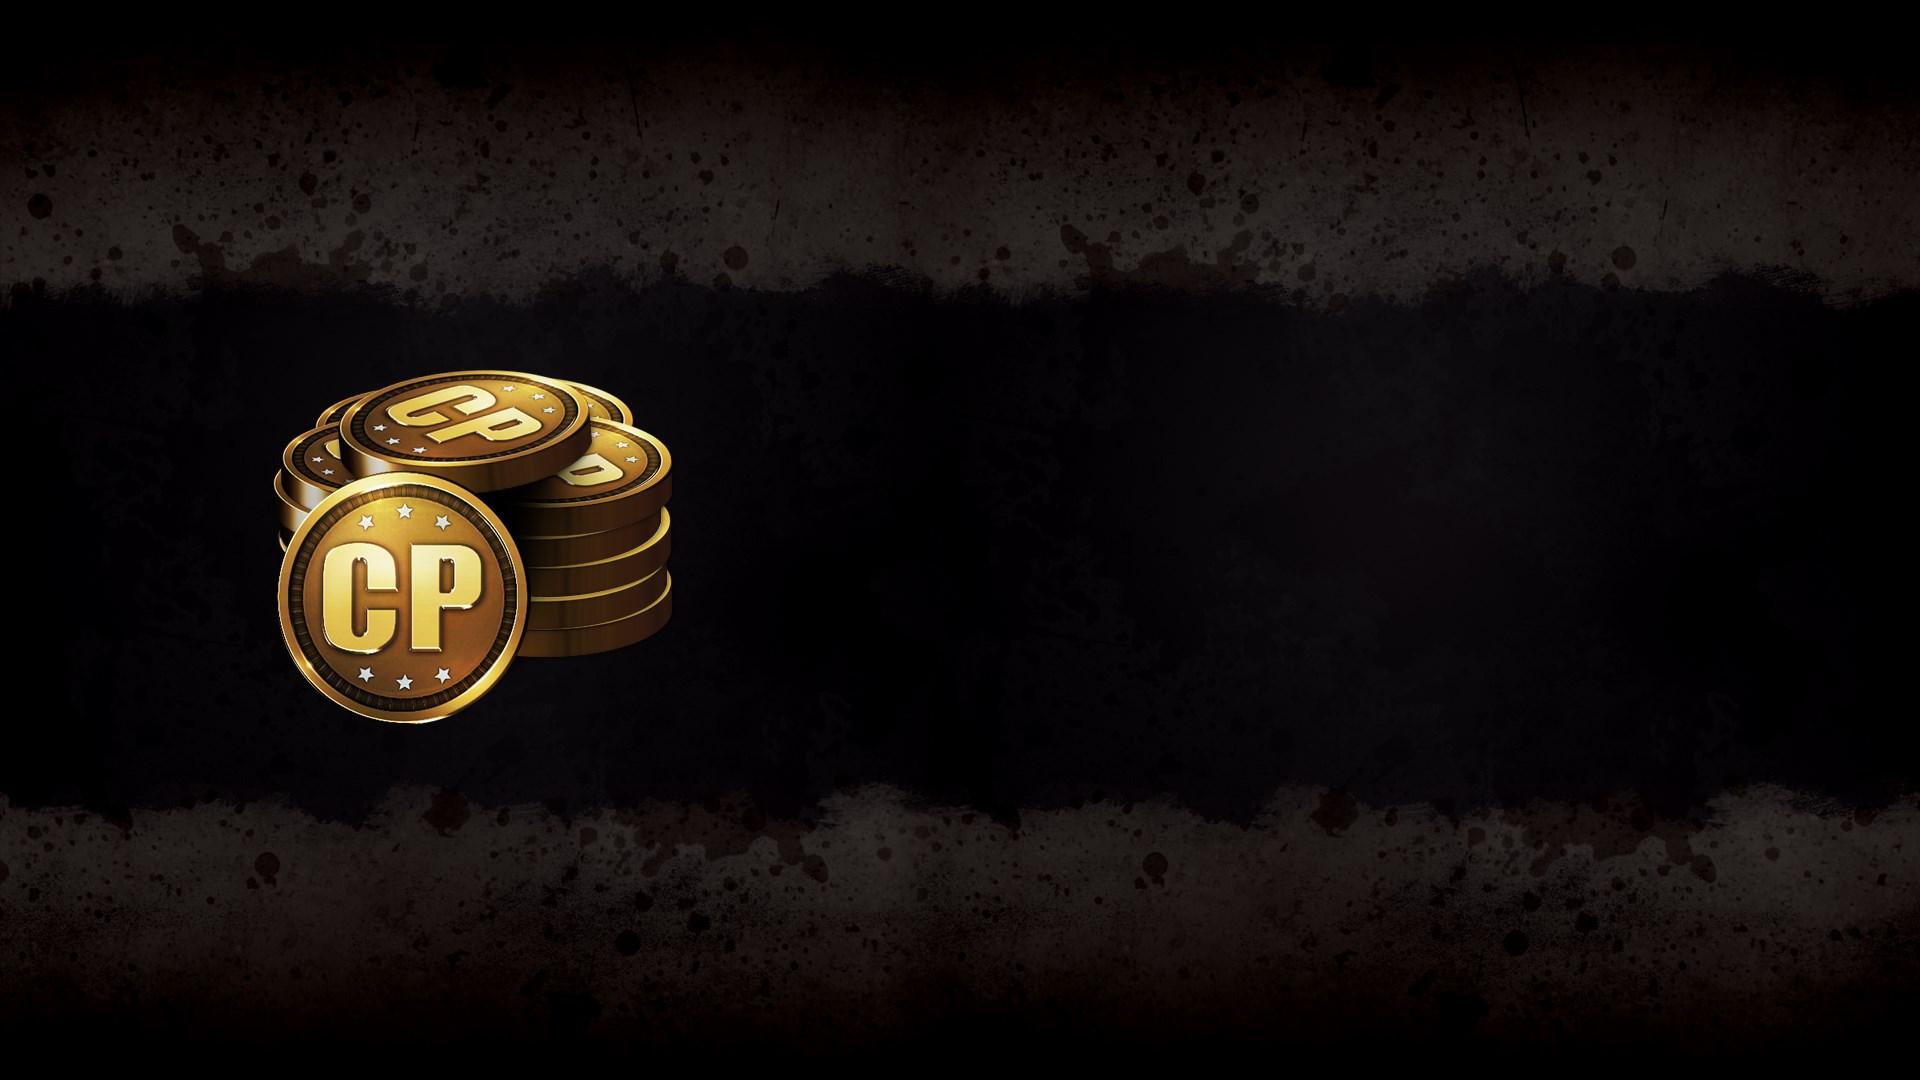 2,400 Call of Duty®: Infinite Warfare Points